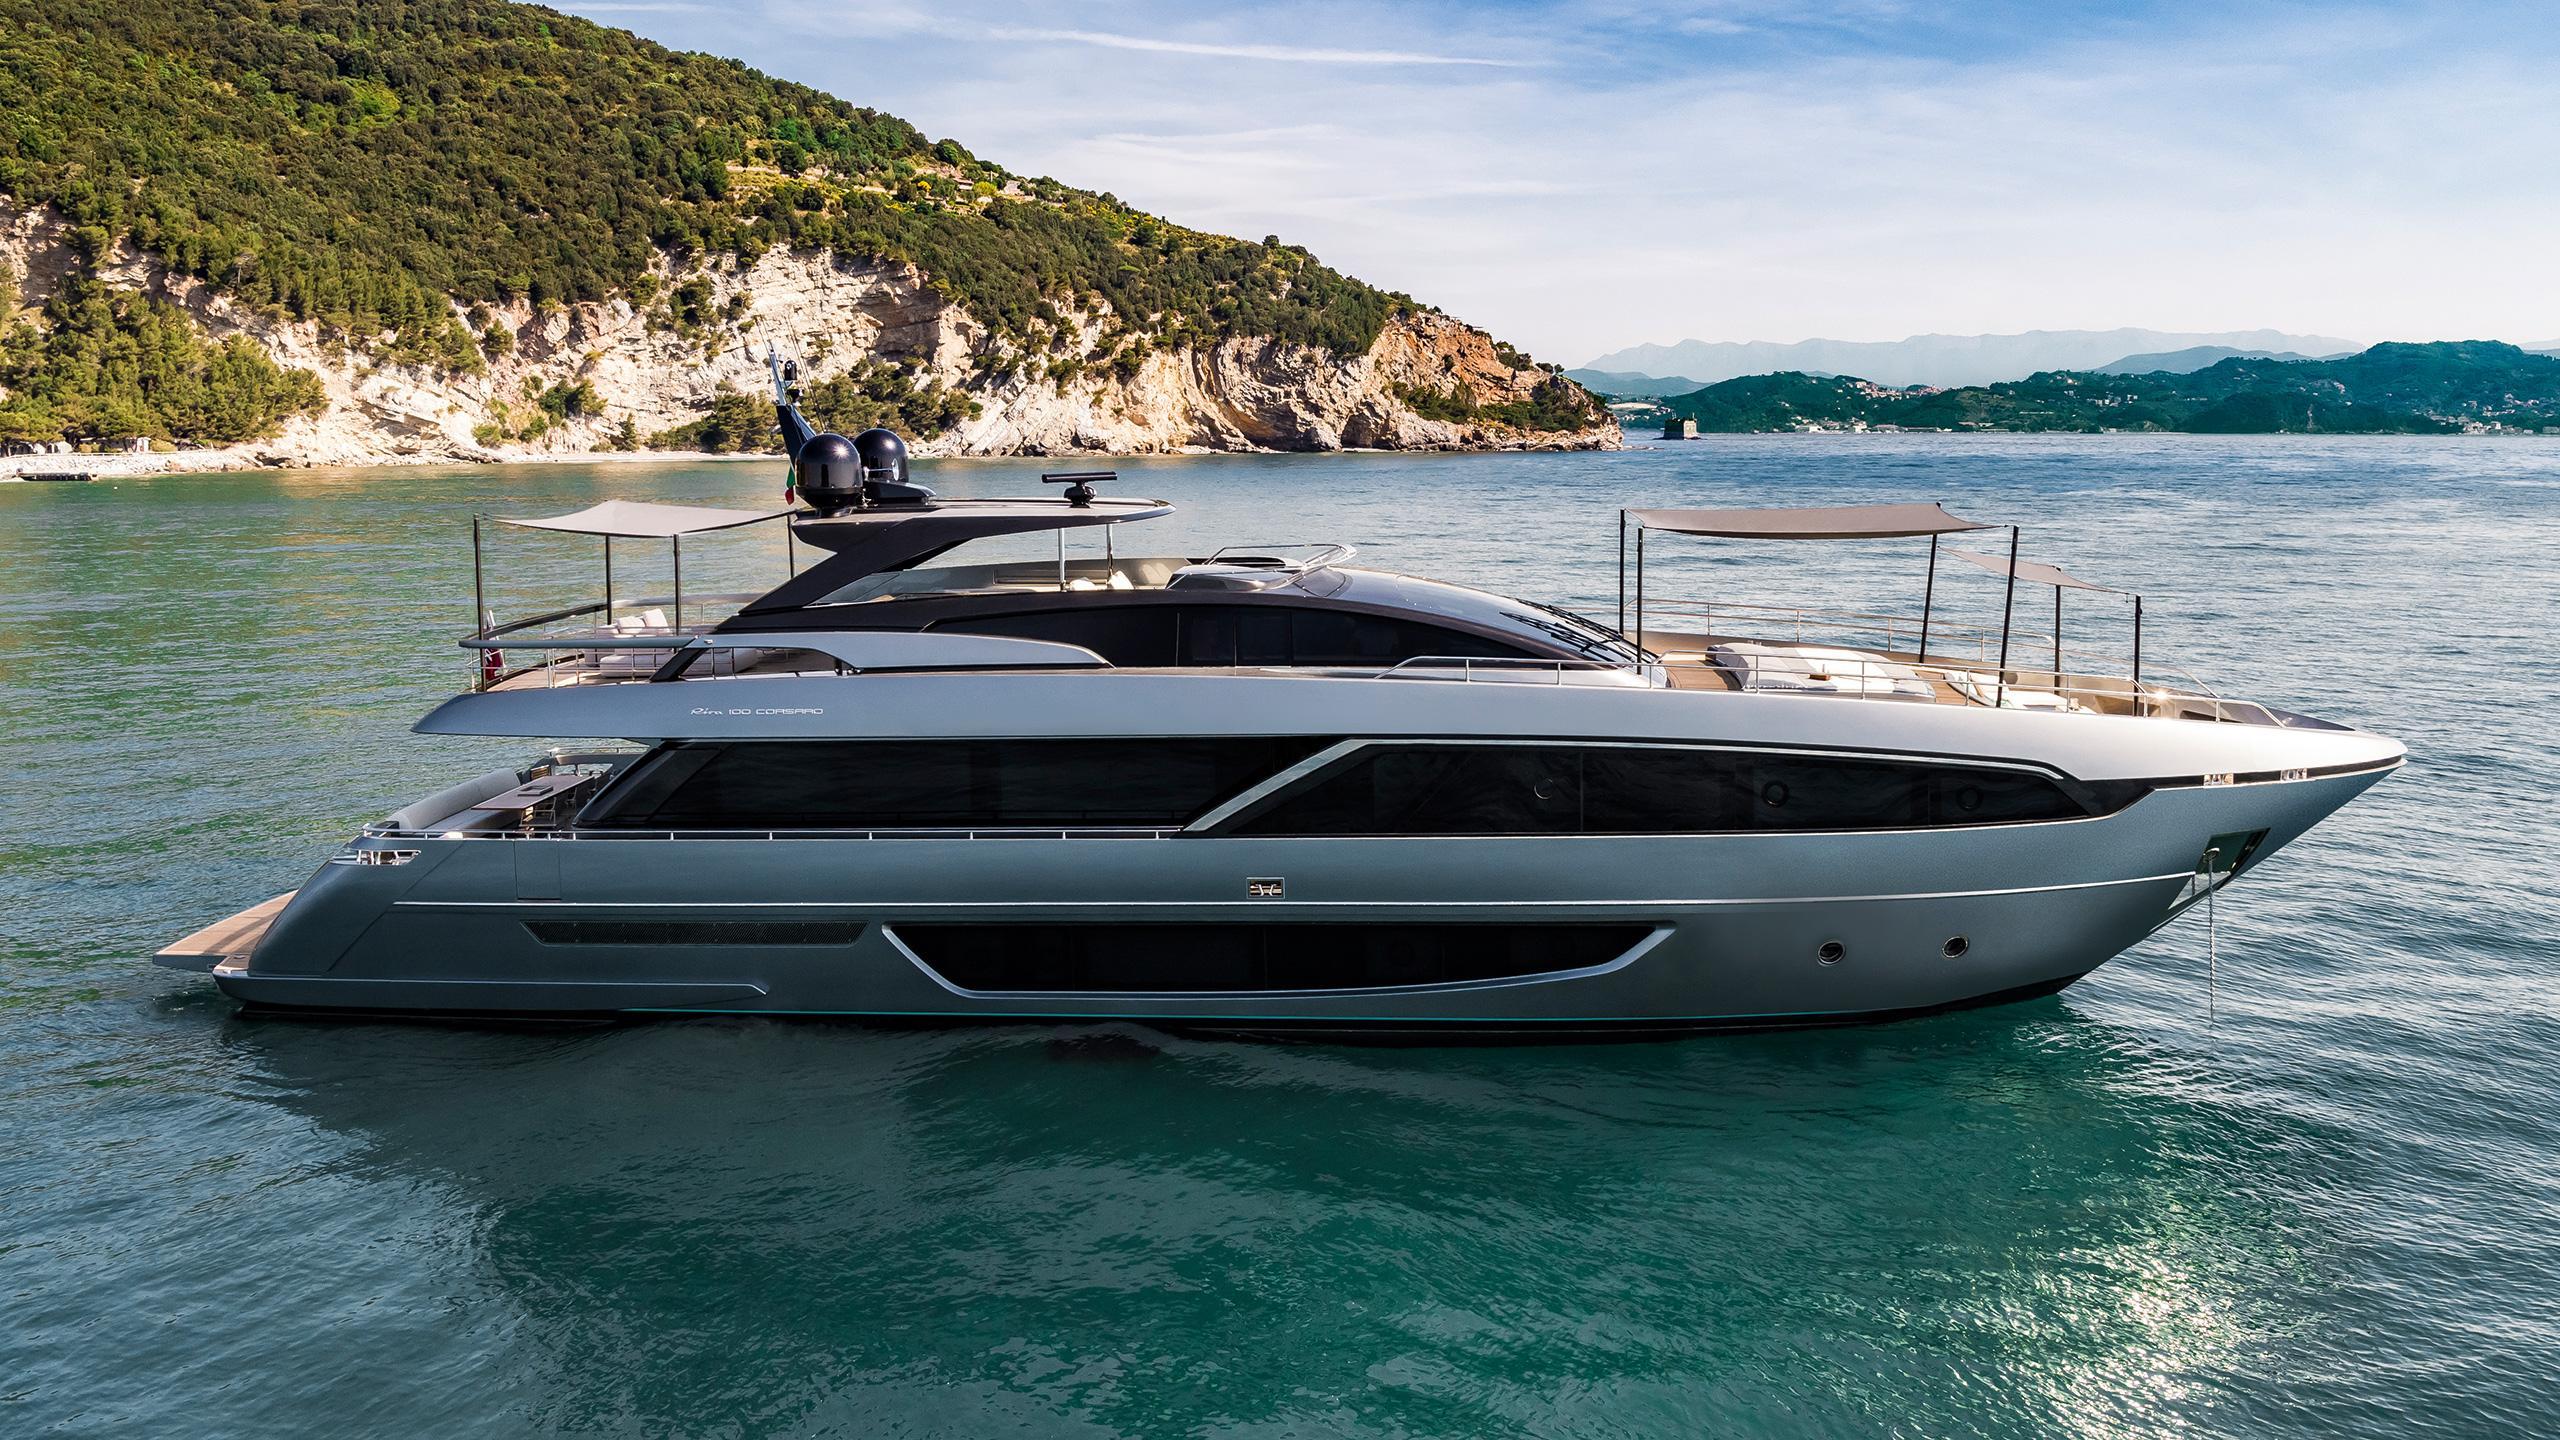 POCMI64SSqivY9tVDwsg Riva 100 corsaro yacht wild one hero credit alberto cocchi 2560x1440